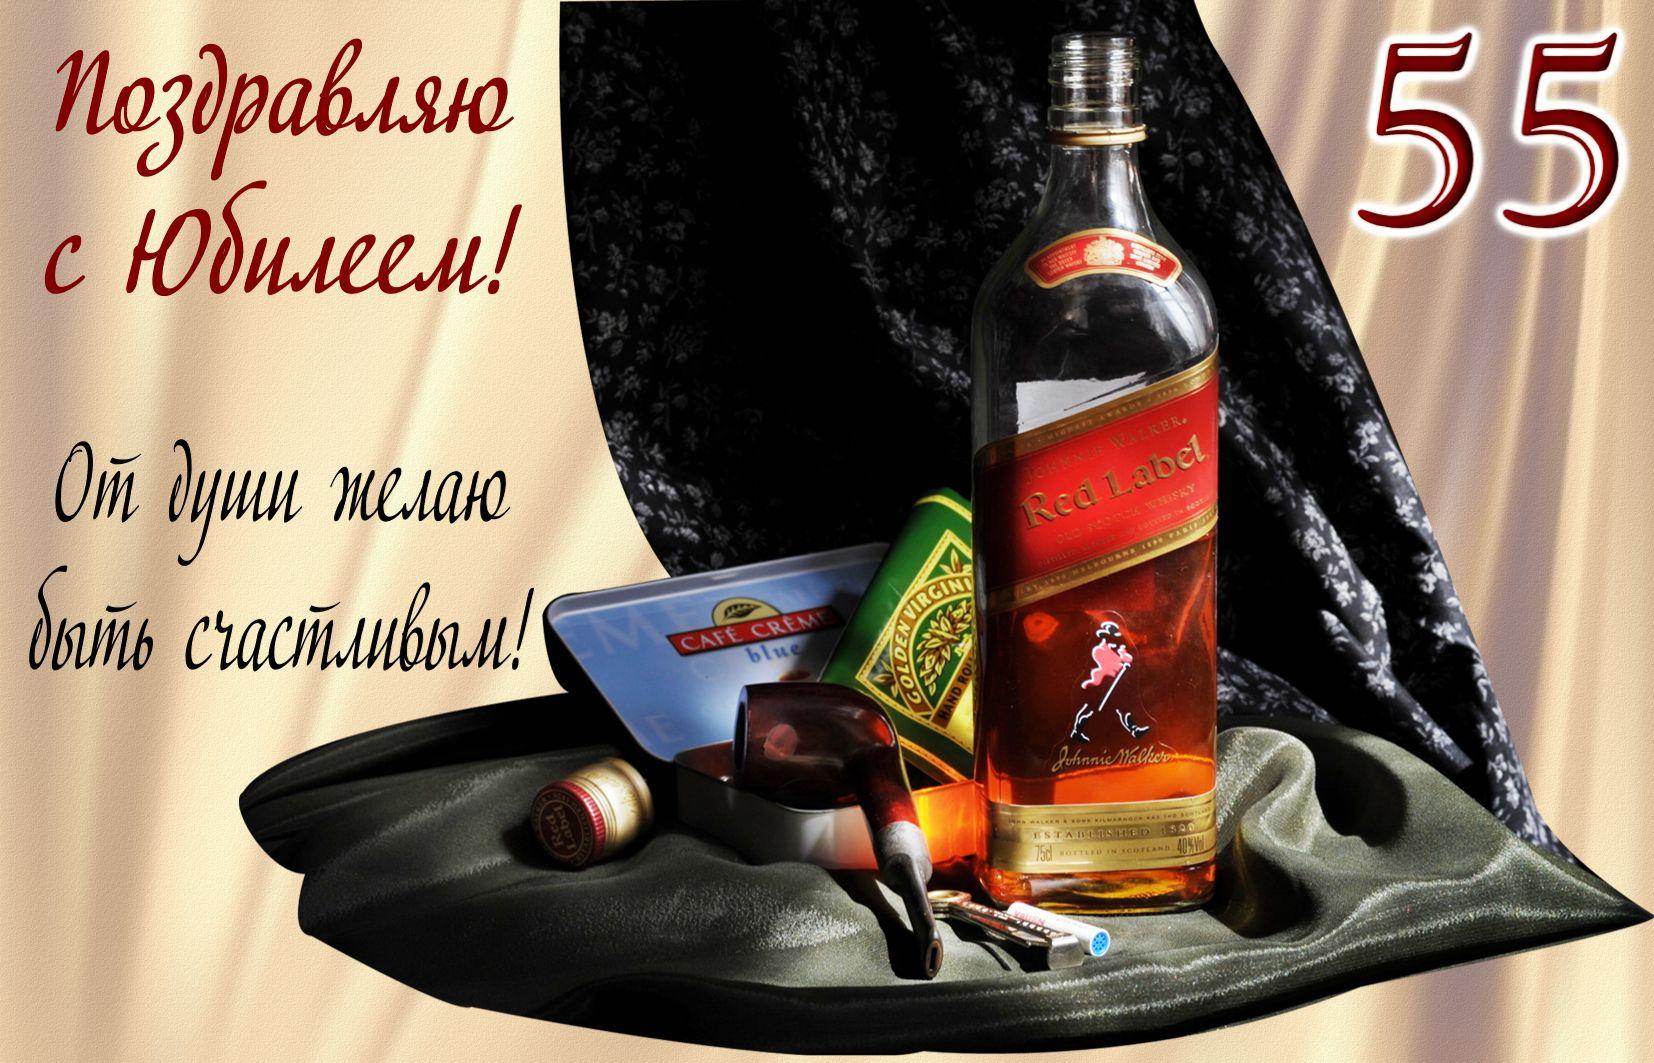 Открытка на юбилей 55 лет - пожелание и виски на черном бархате